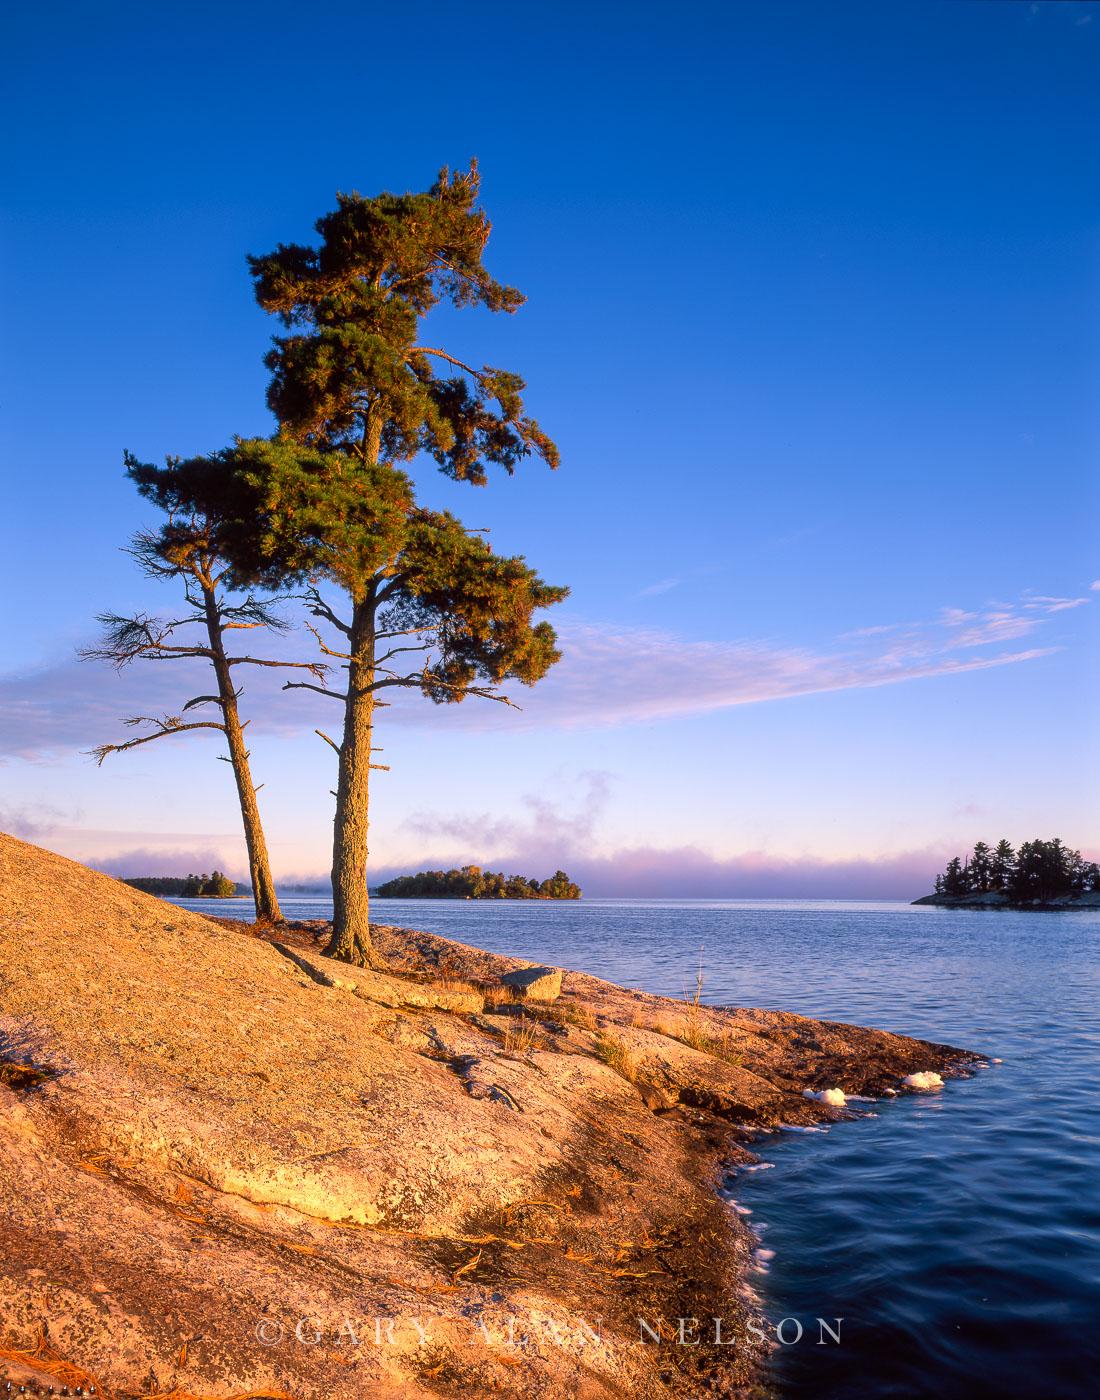 voyageurs national park, minnesota, white pine, photo